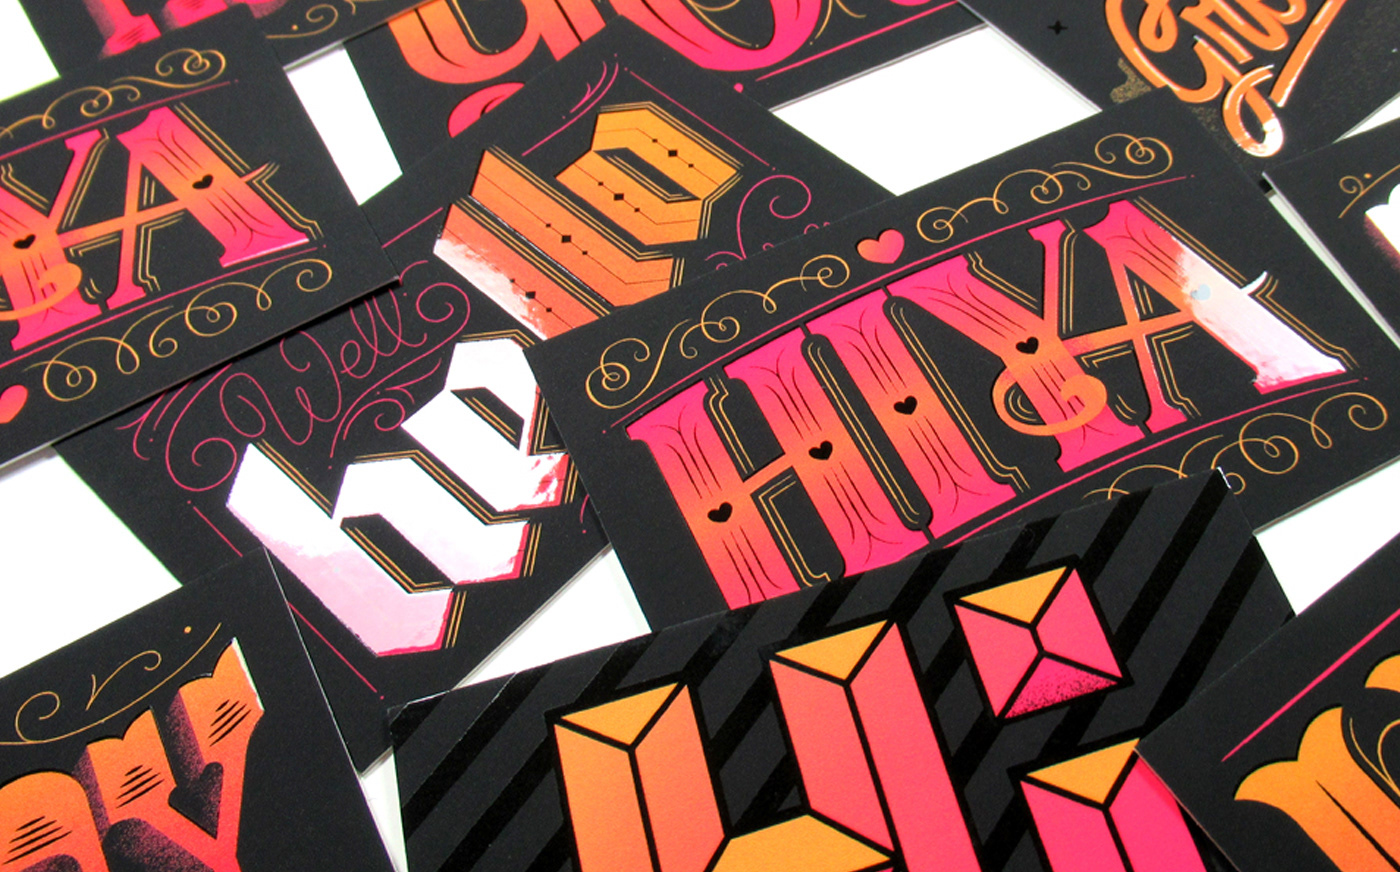 type typography   typographer letterer lettering bespoke lettering Business Cards spot uv print graphic design